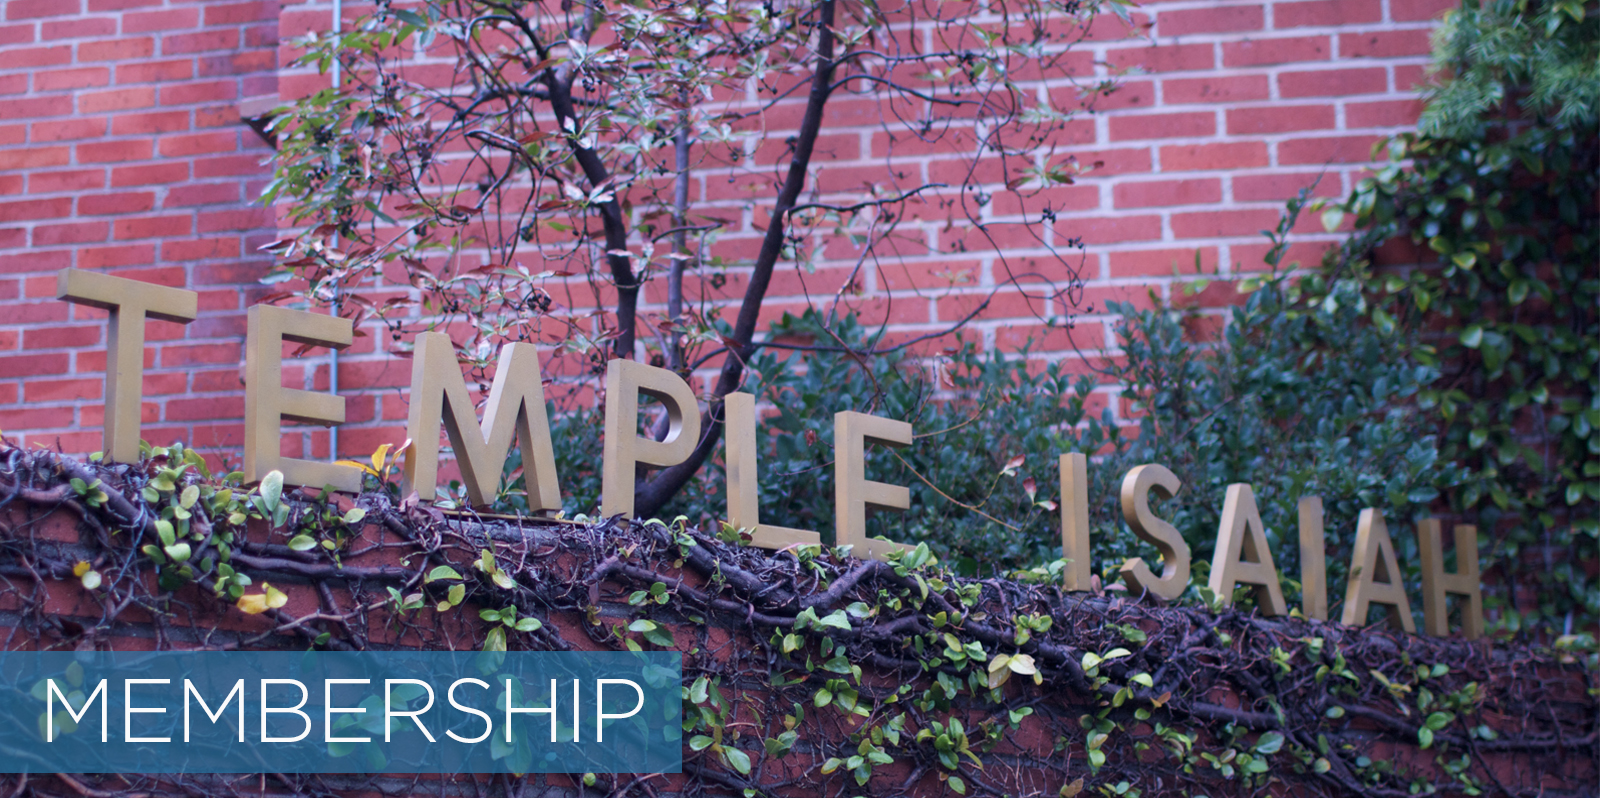 /home/templeis/public_html/images/header_image/1445448329header_image01_membership.jpg.